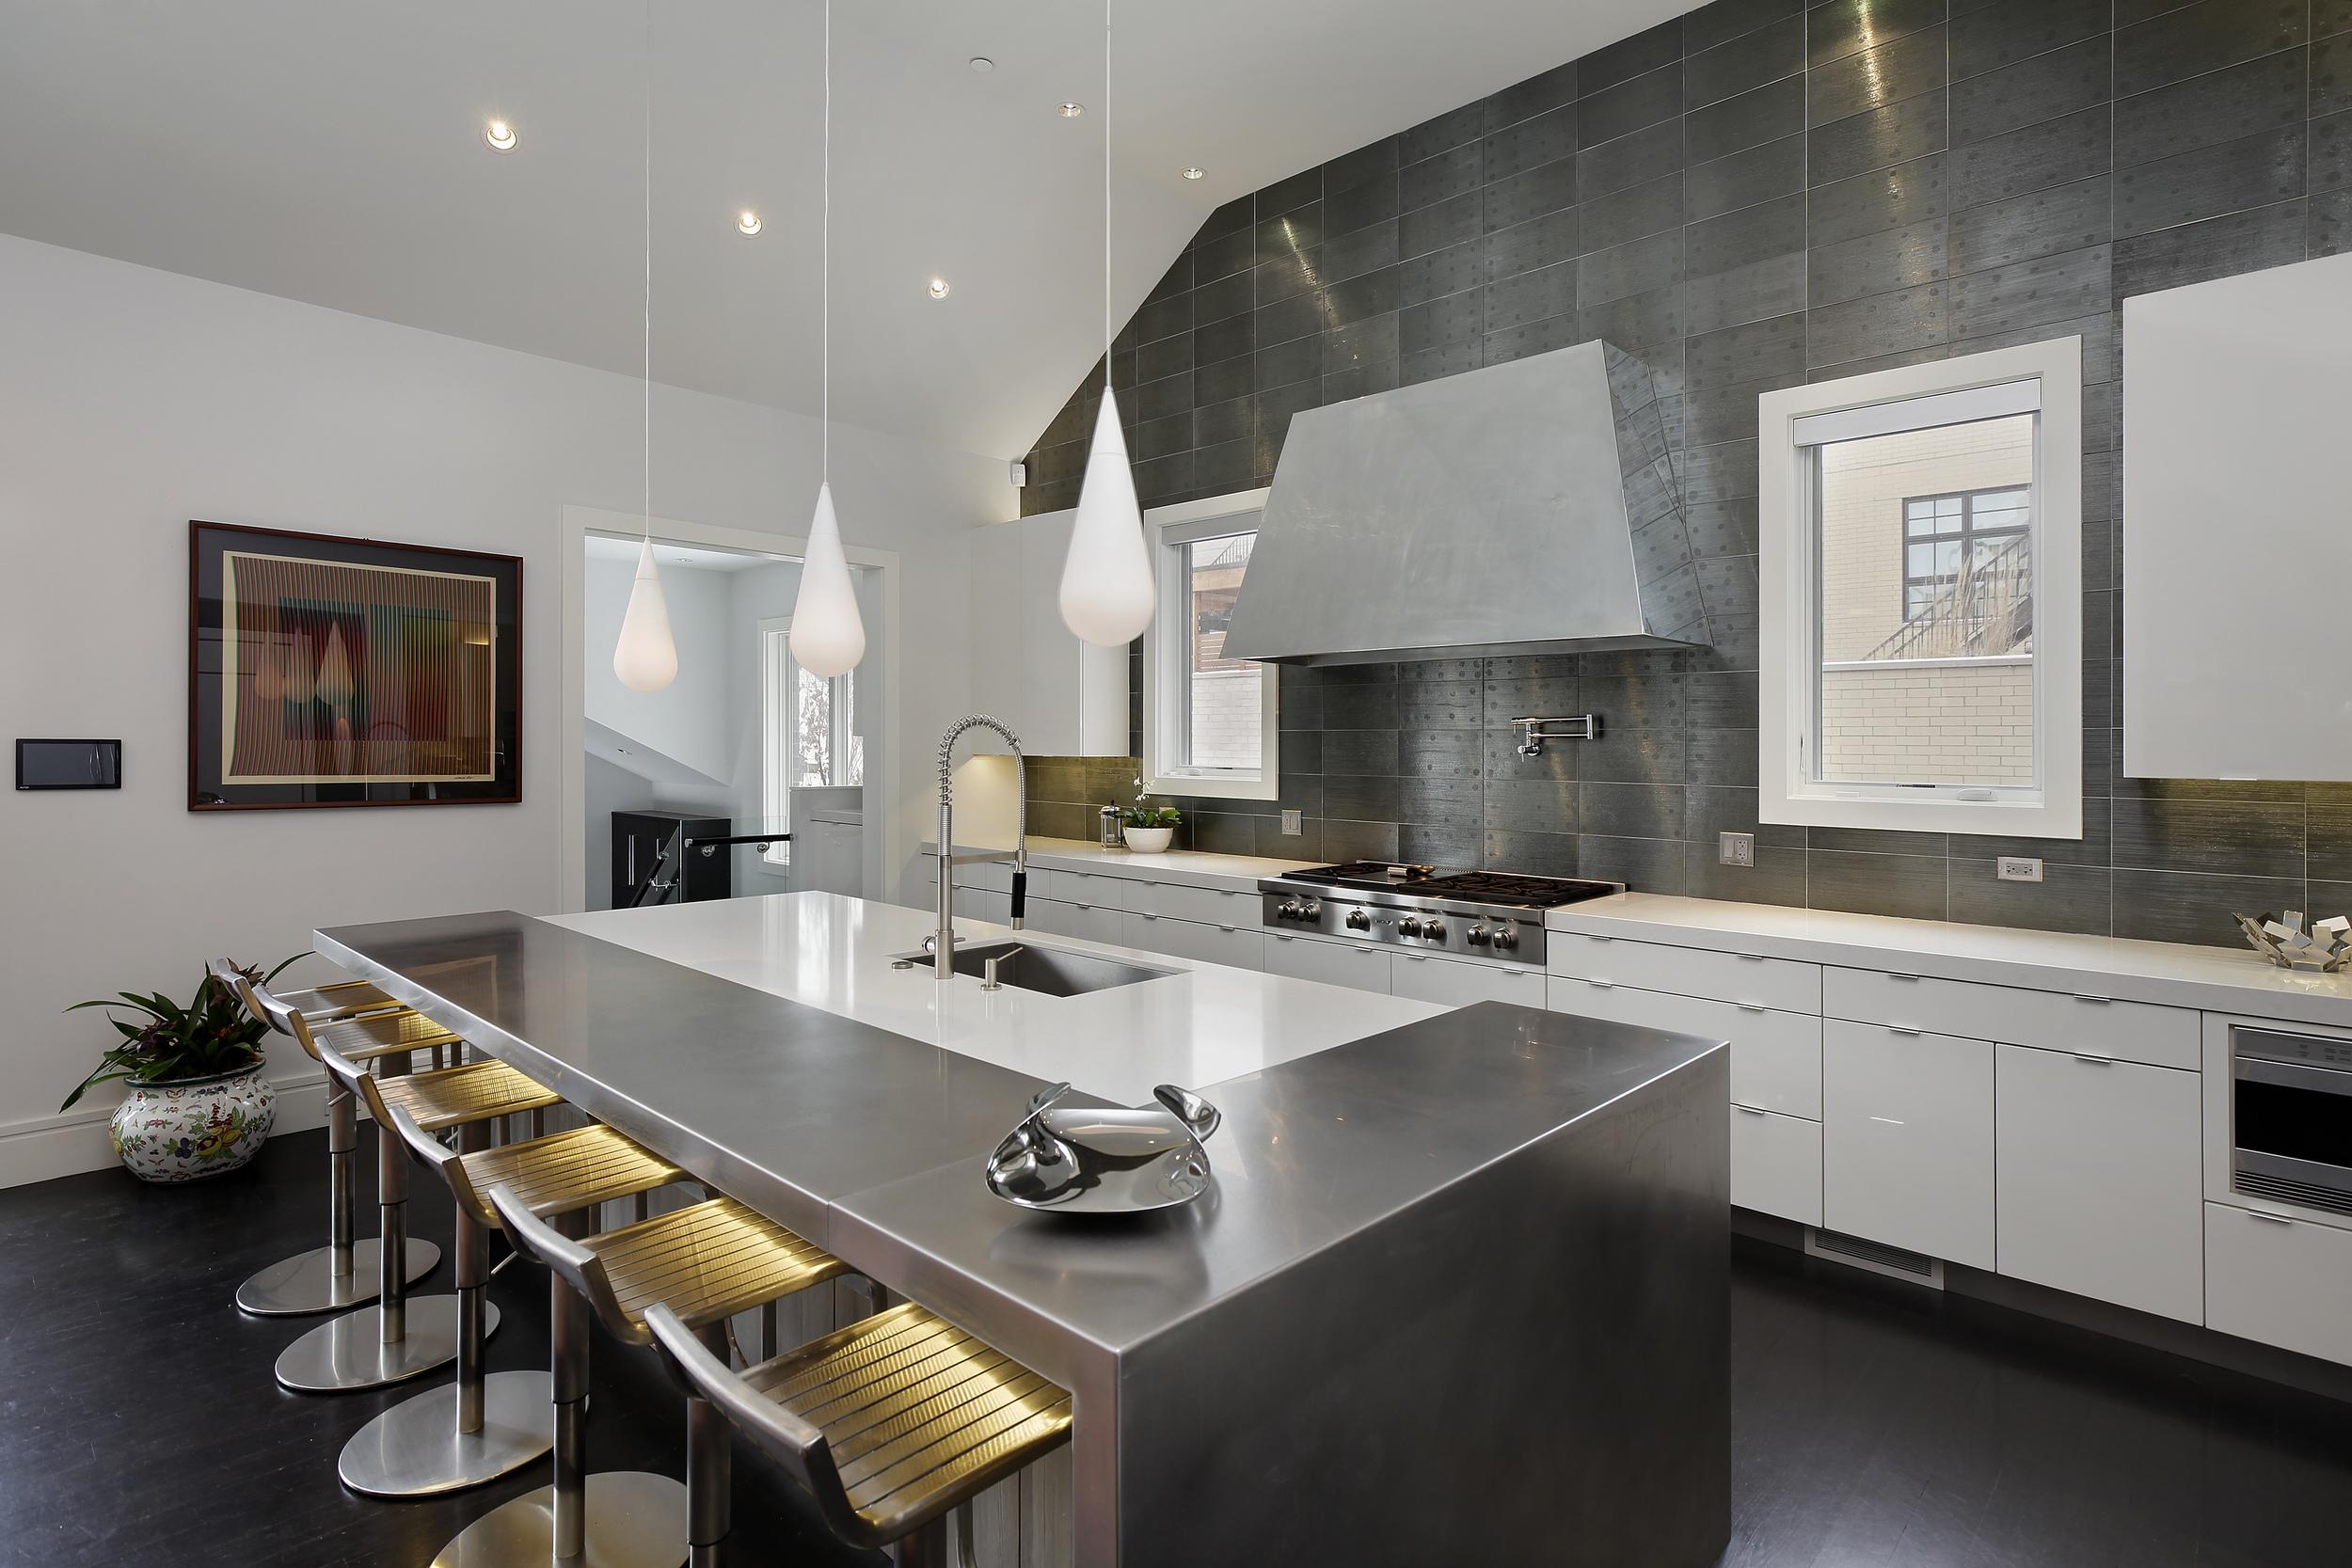 kitchen3_2715nlakewood.jpg